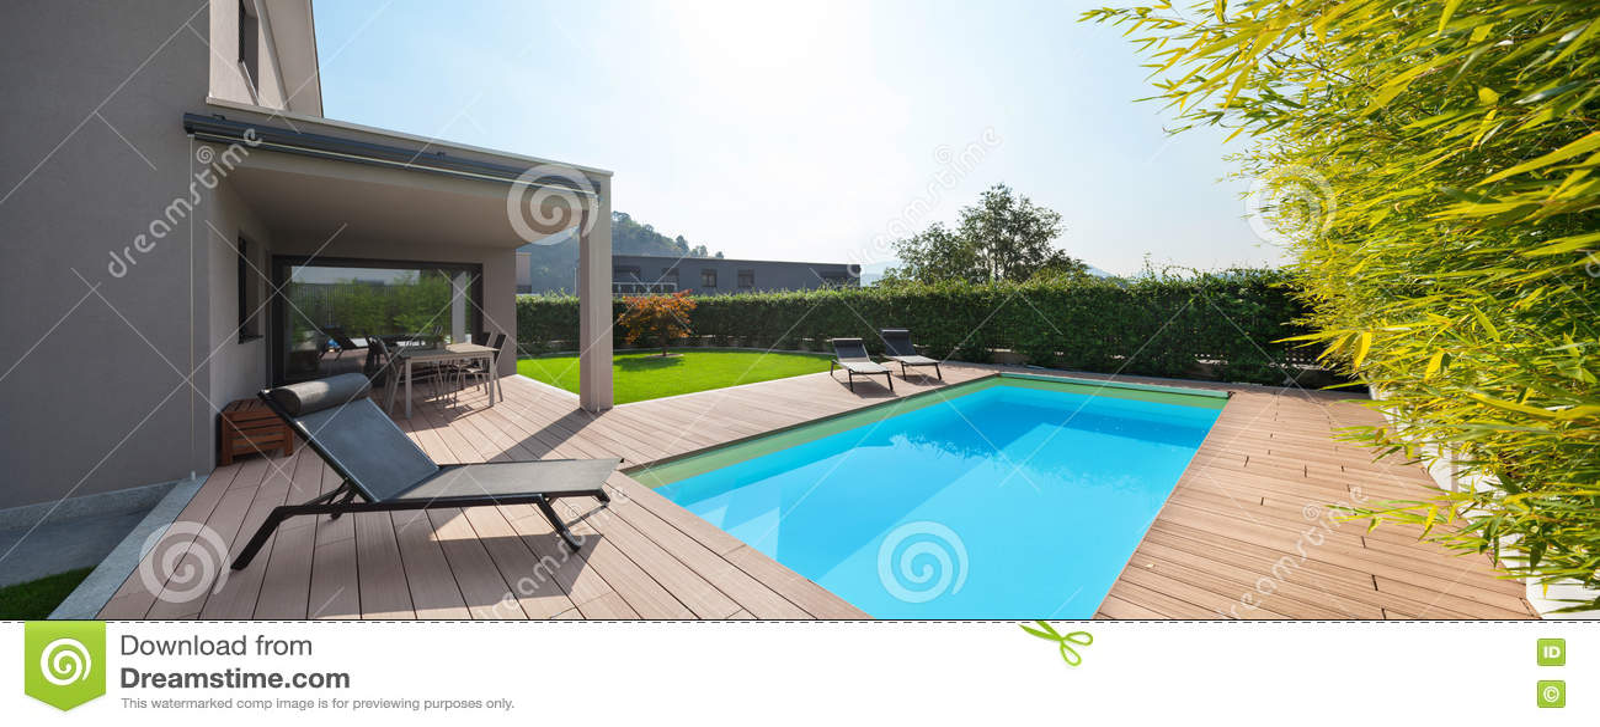 Casa moderna con la piscina